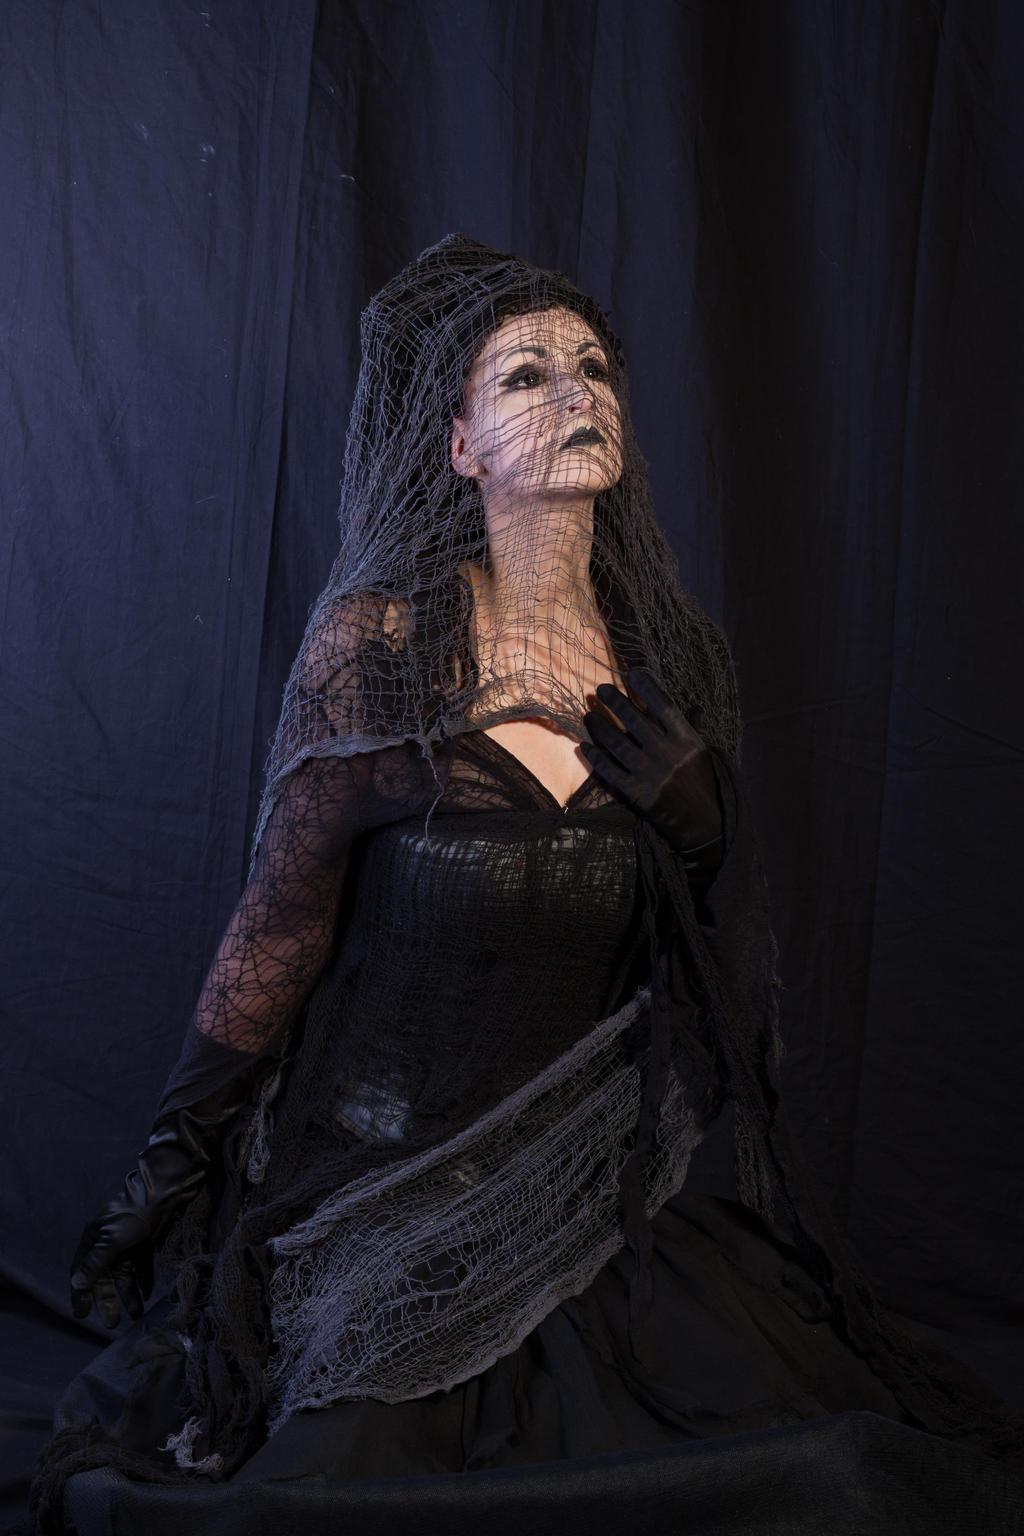 Stock - gothic dark web look up by S-T-A-R-gazer